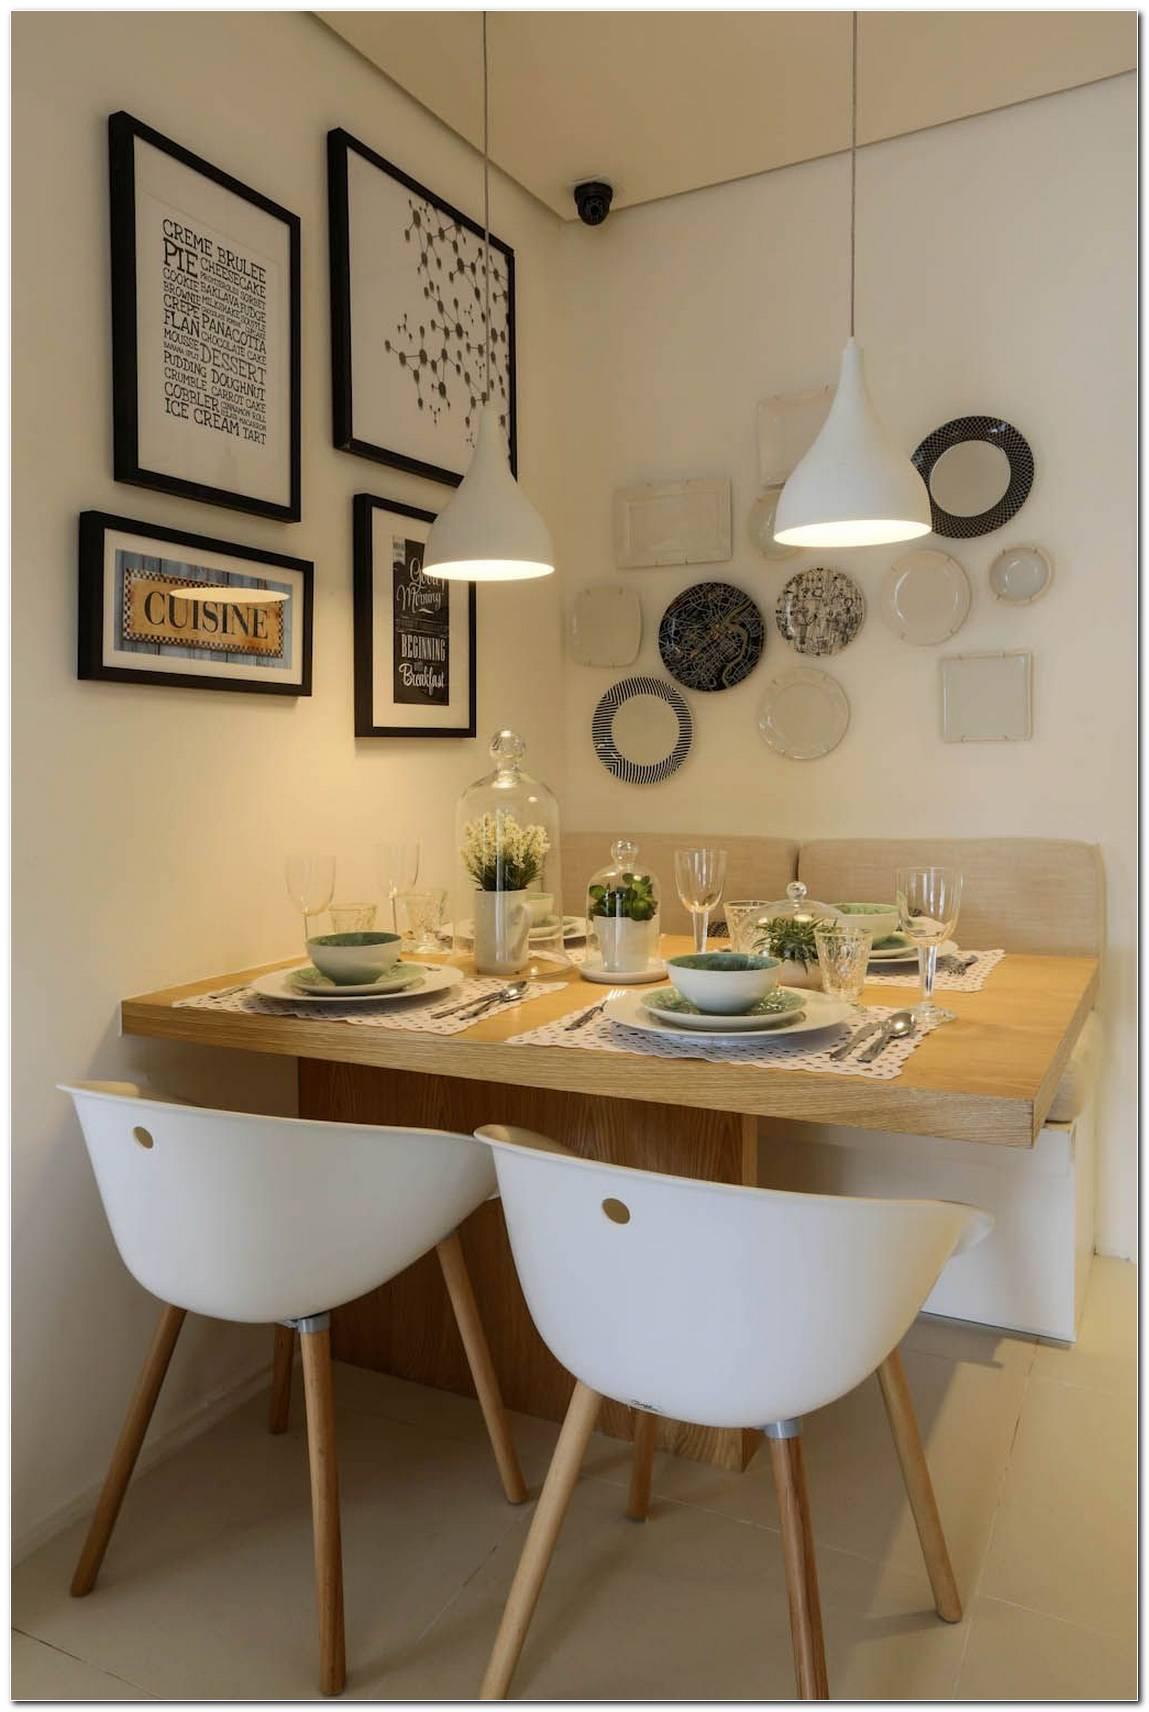 Sala De Jantar Pequena Com Mesa Quadrada